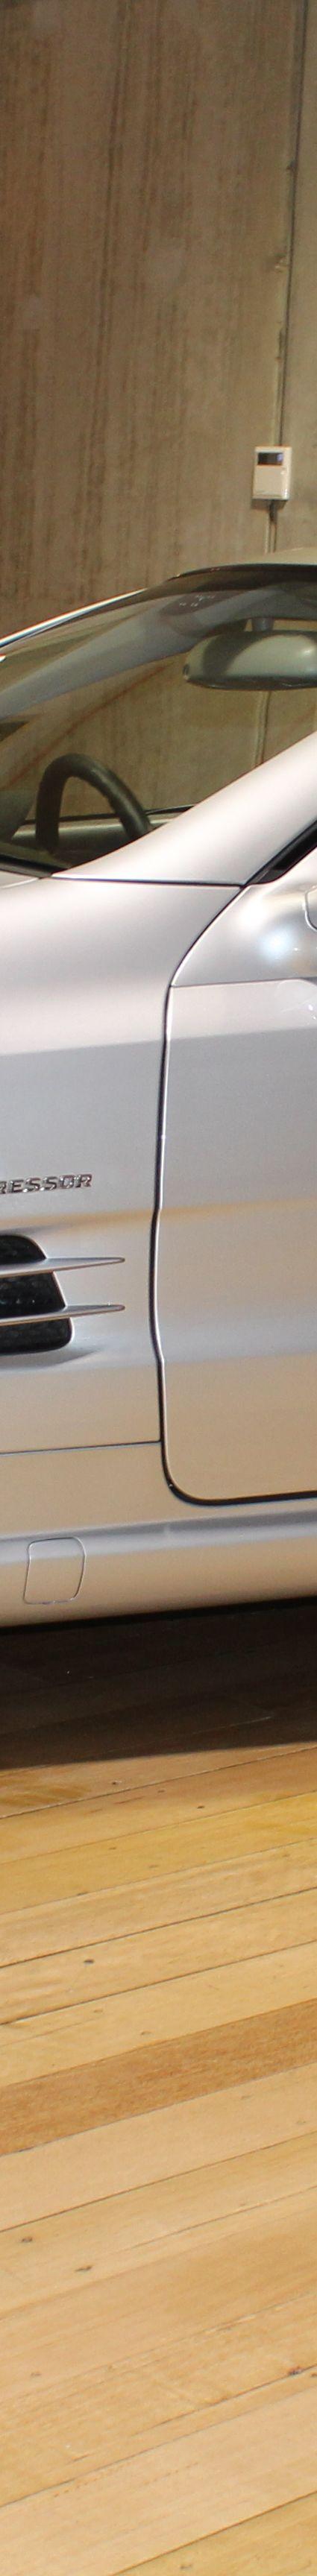 2005 MERCEDES SL55 R230 MY05 AMG- for sale in Australia